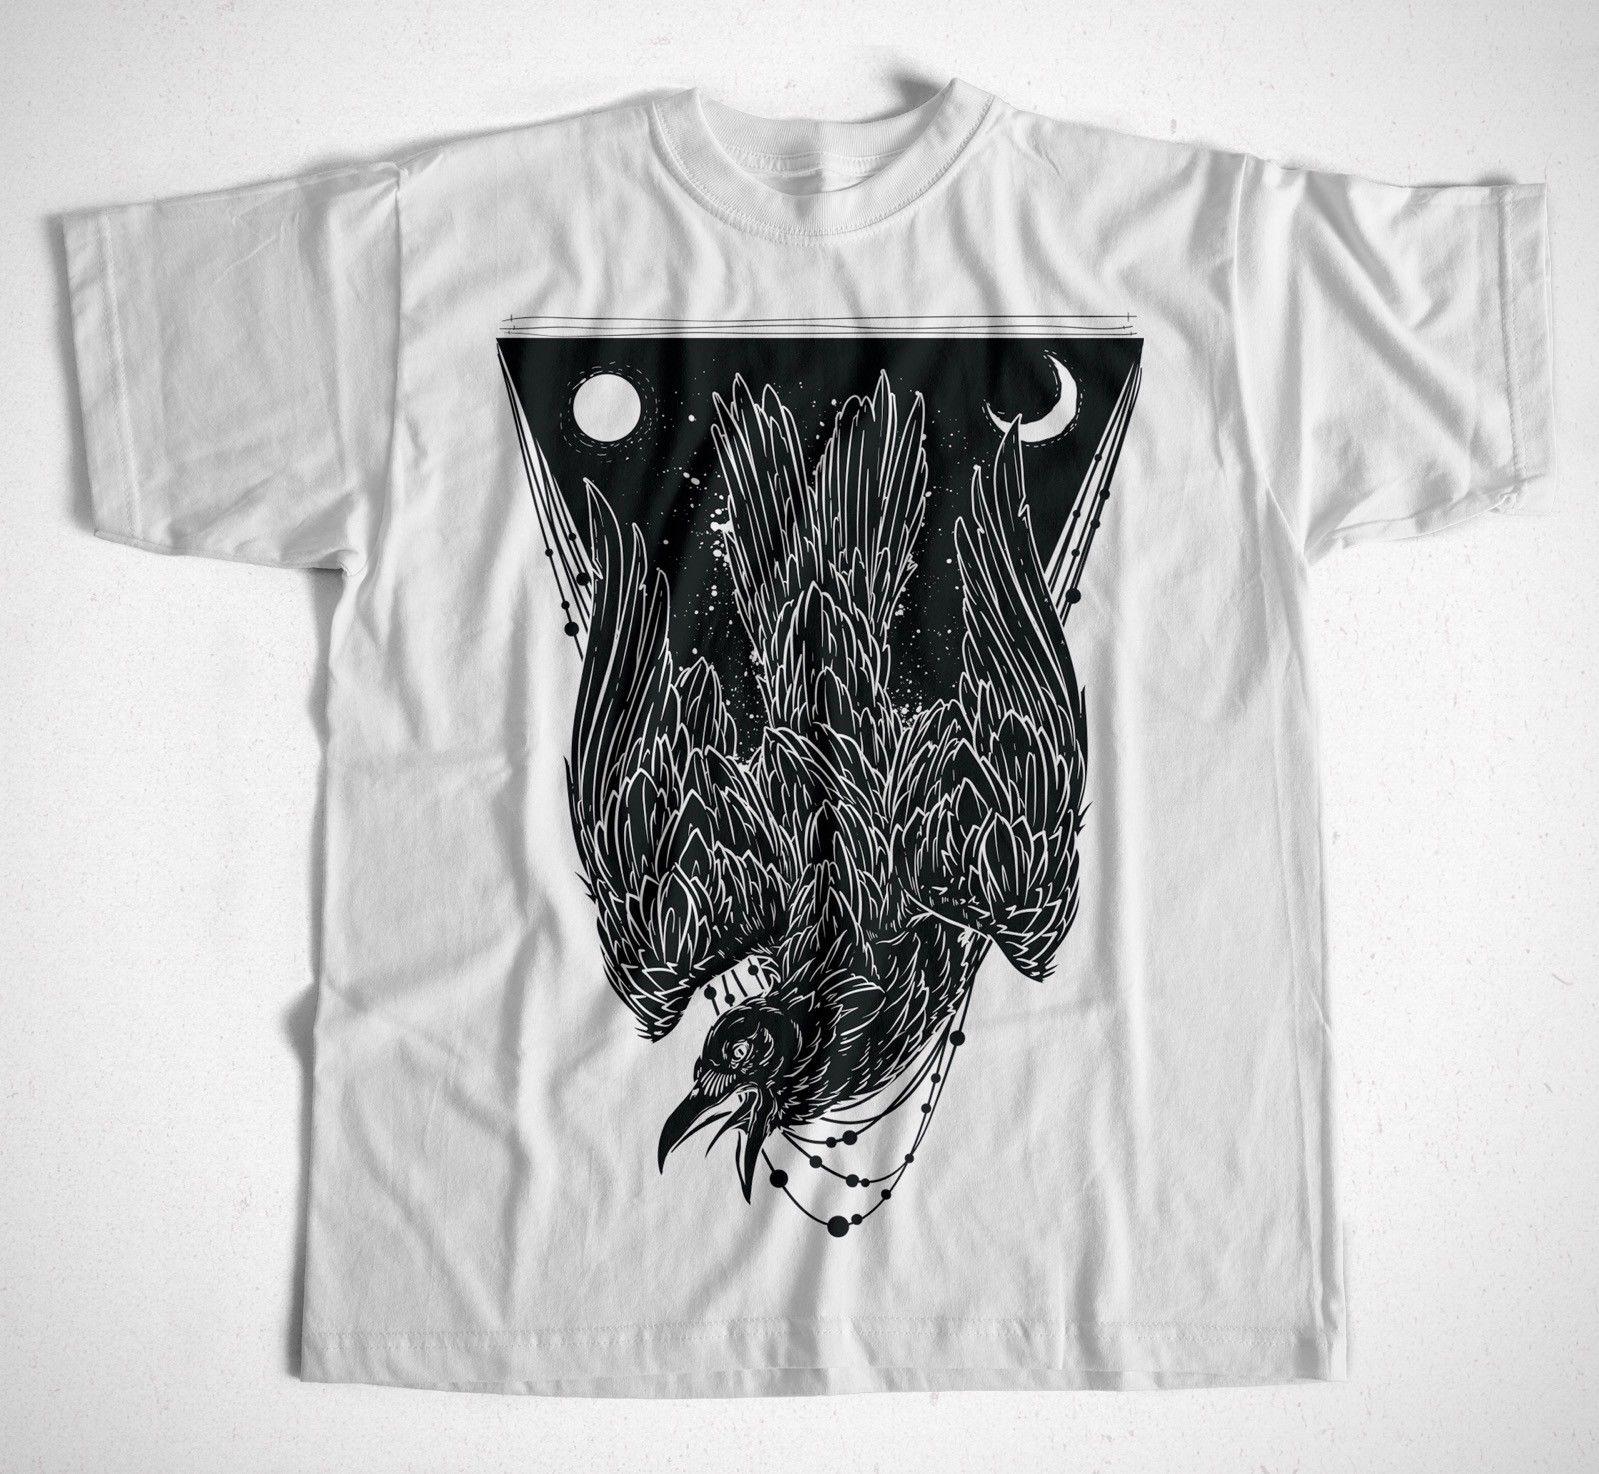 Camiseta de Manga corta de algodón con estampado de cuervo S-XXXL Rabe Vogel Hipster Streetwear Mond Hexe Goth Manga 100% para hombre